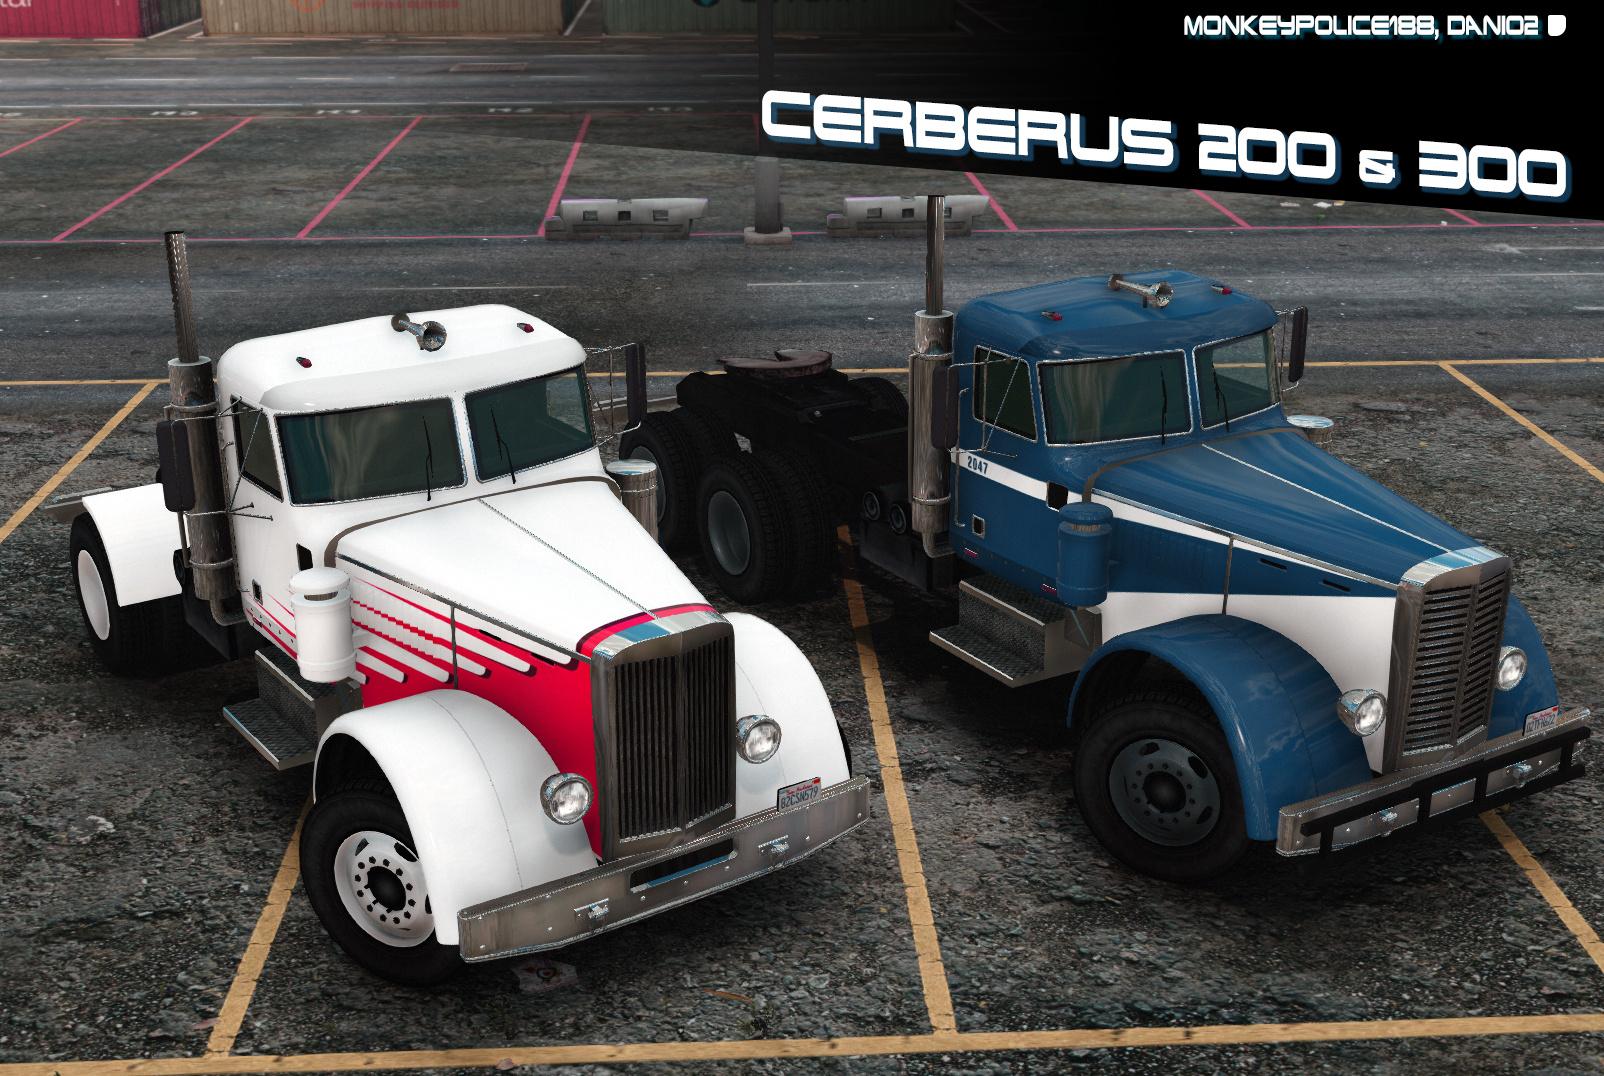 f96057-Cerberus%20200%20and%20300.jpg